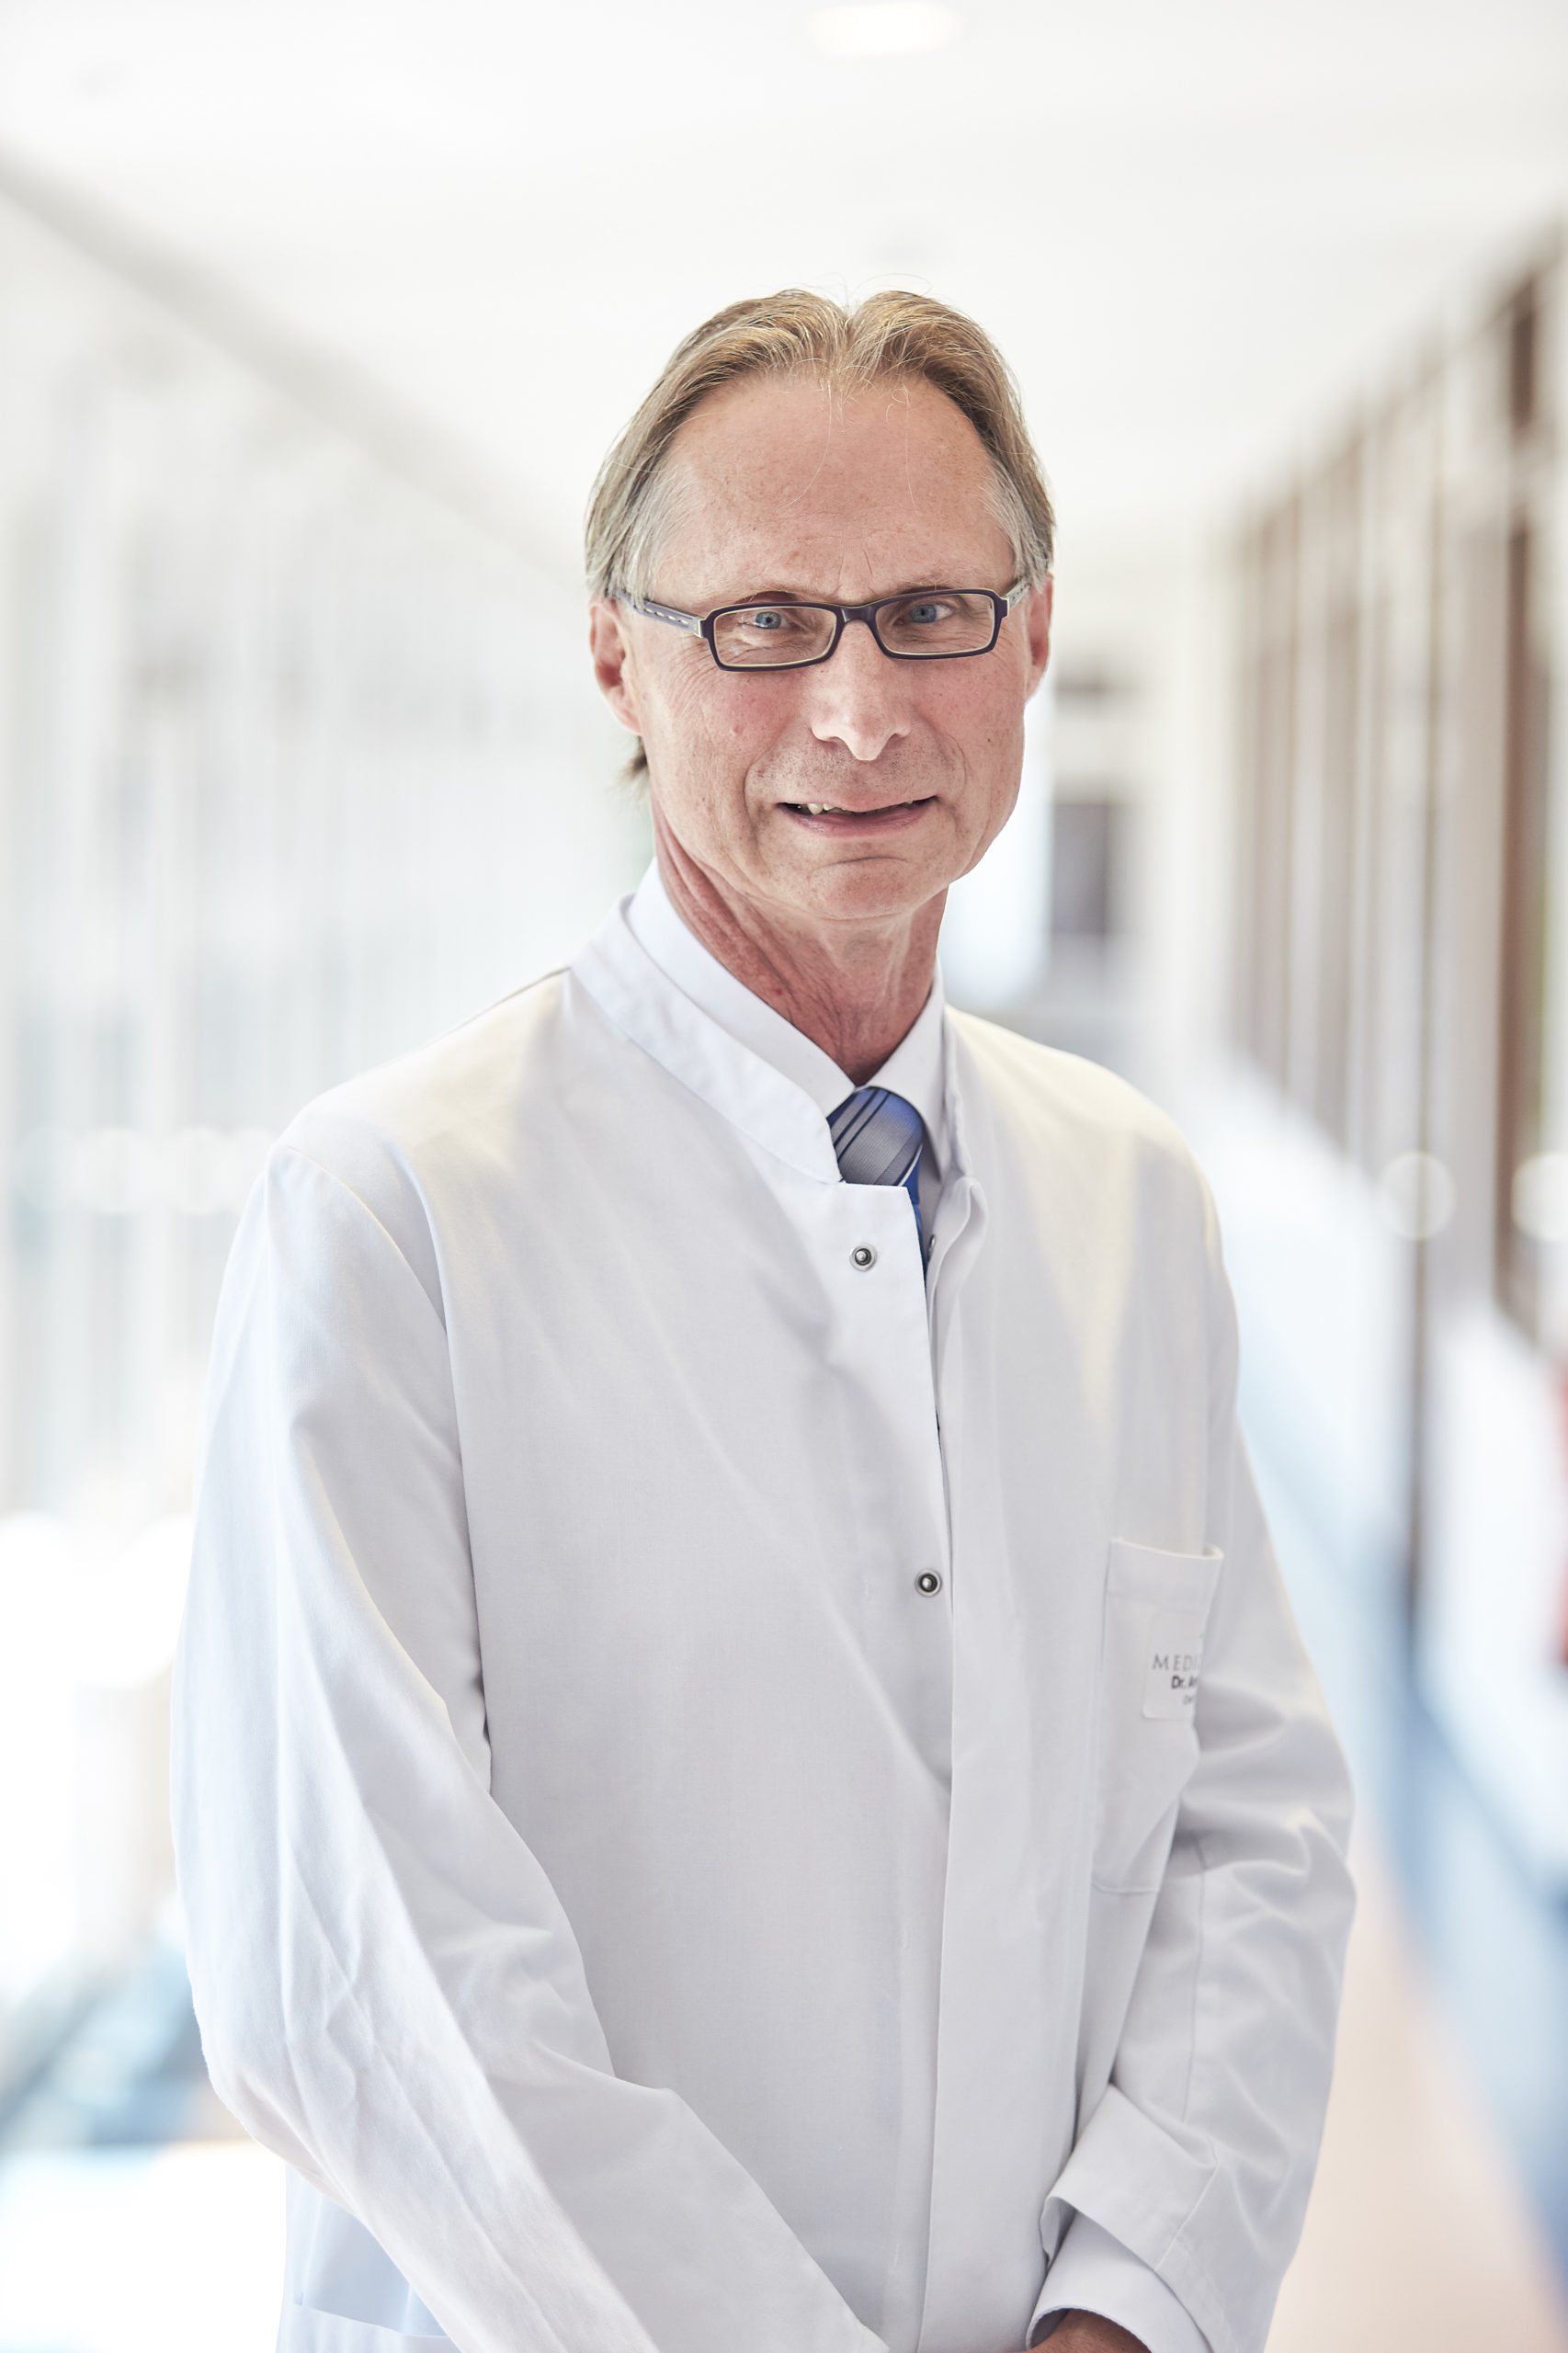 Chefarzt der Onkologie, Dr. med. Andreas Arndt